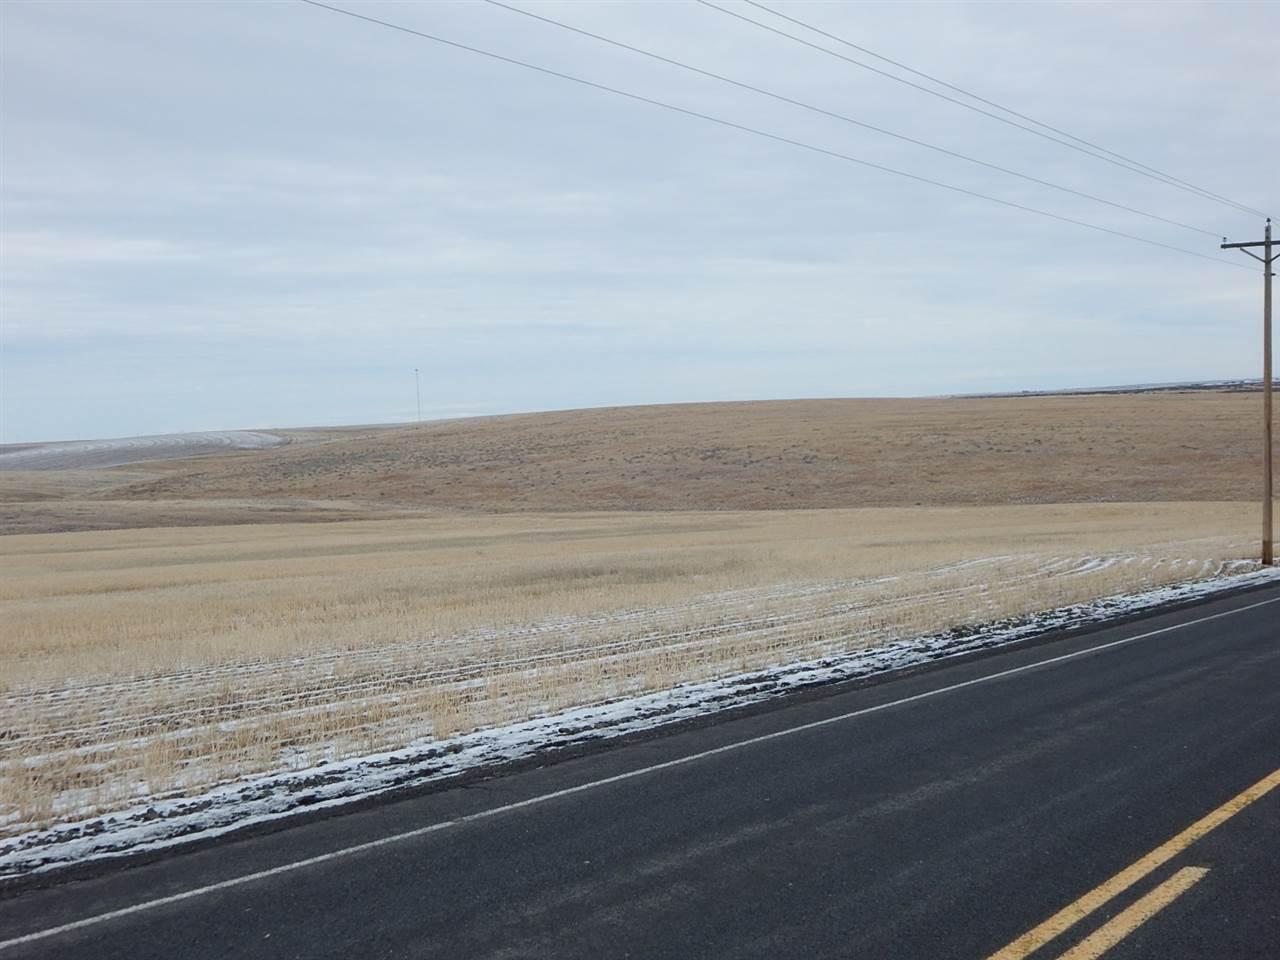 Land for Sale at TBD E Schlimmer Road TBD E Schlimmer Road Odessa, Washington 99159 United States